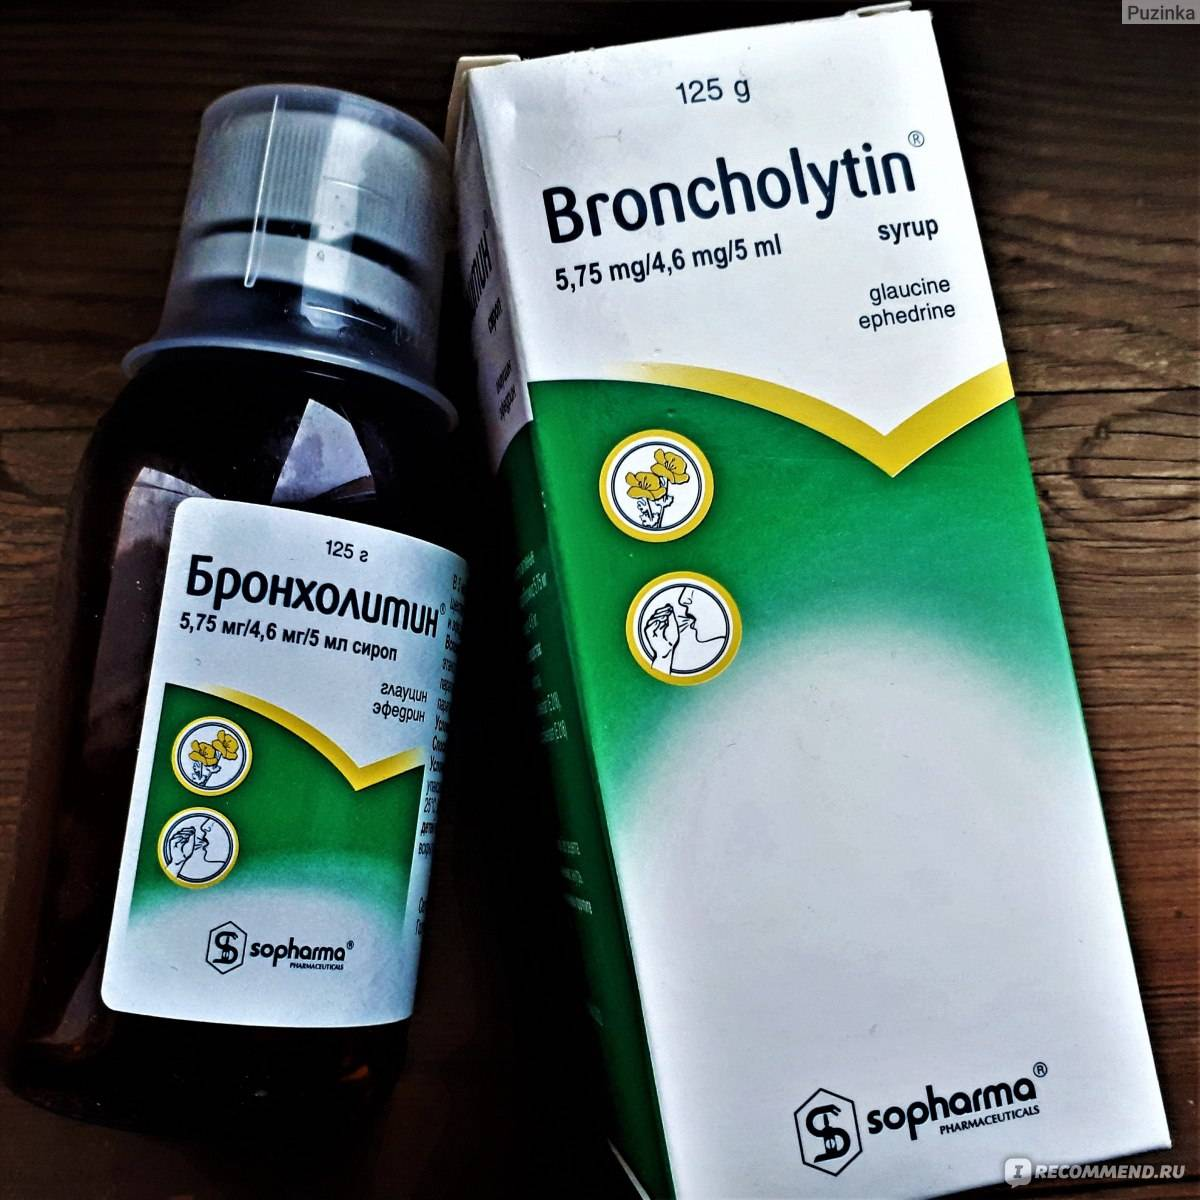 Комплекс эка (бронхолитин, кофеин и аспирин)